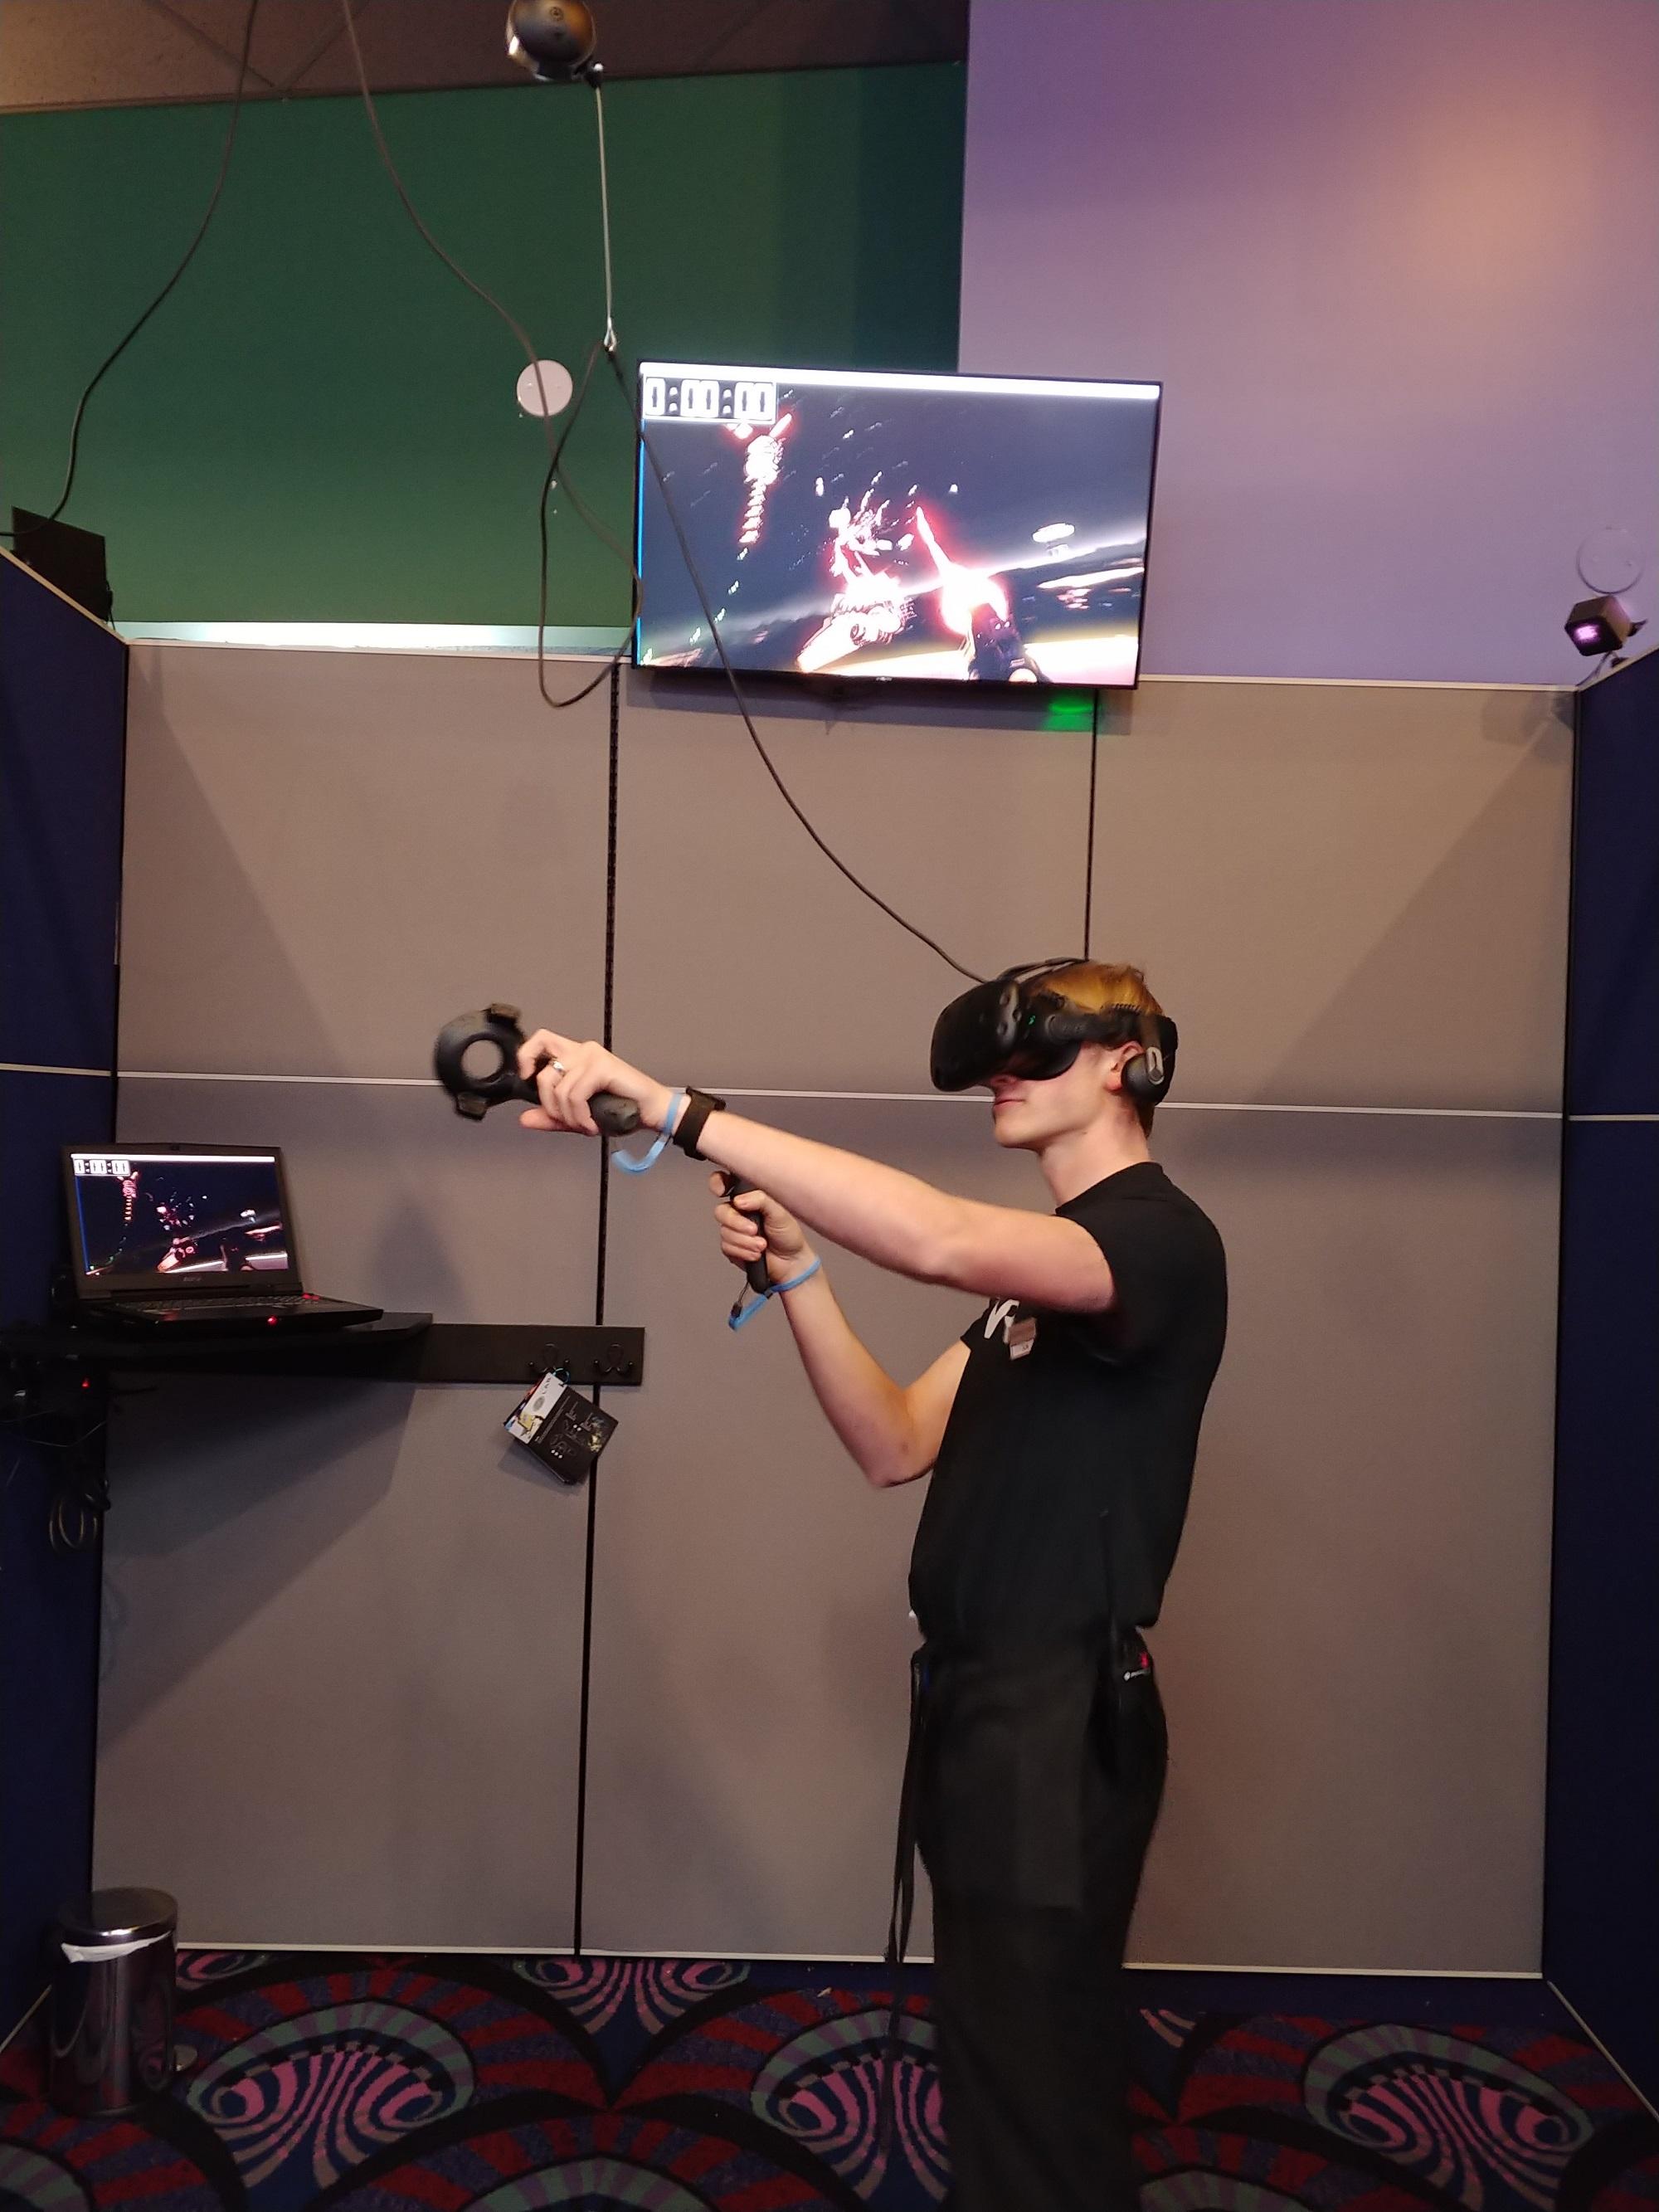 virtual-reality-filme-auf-cinemax